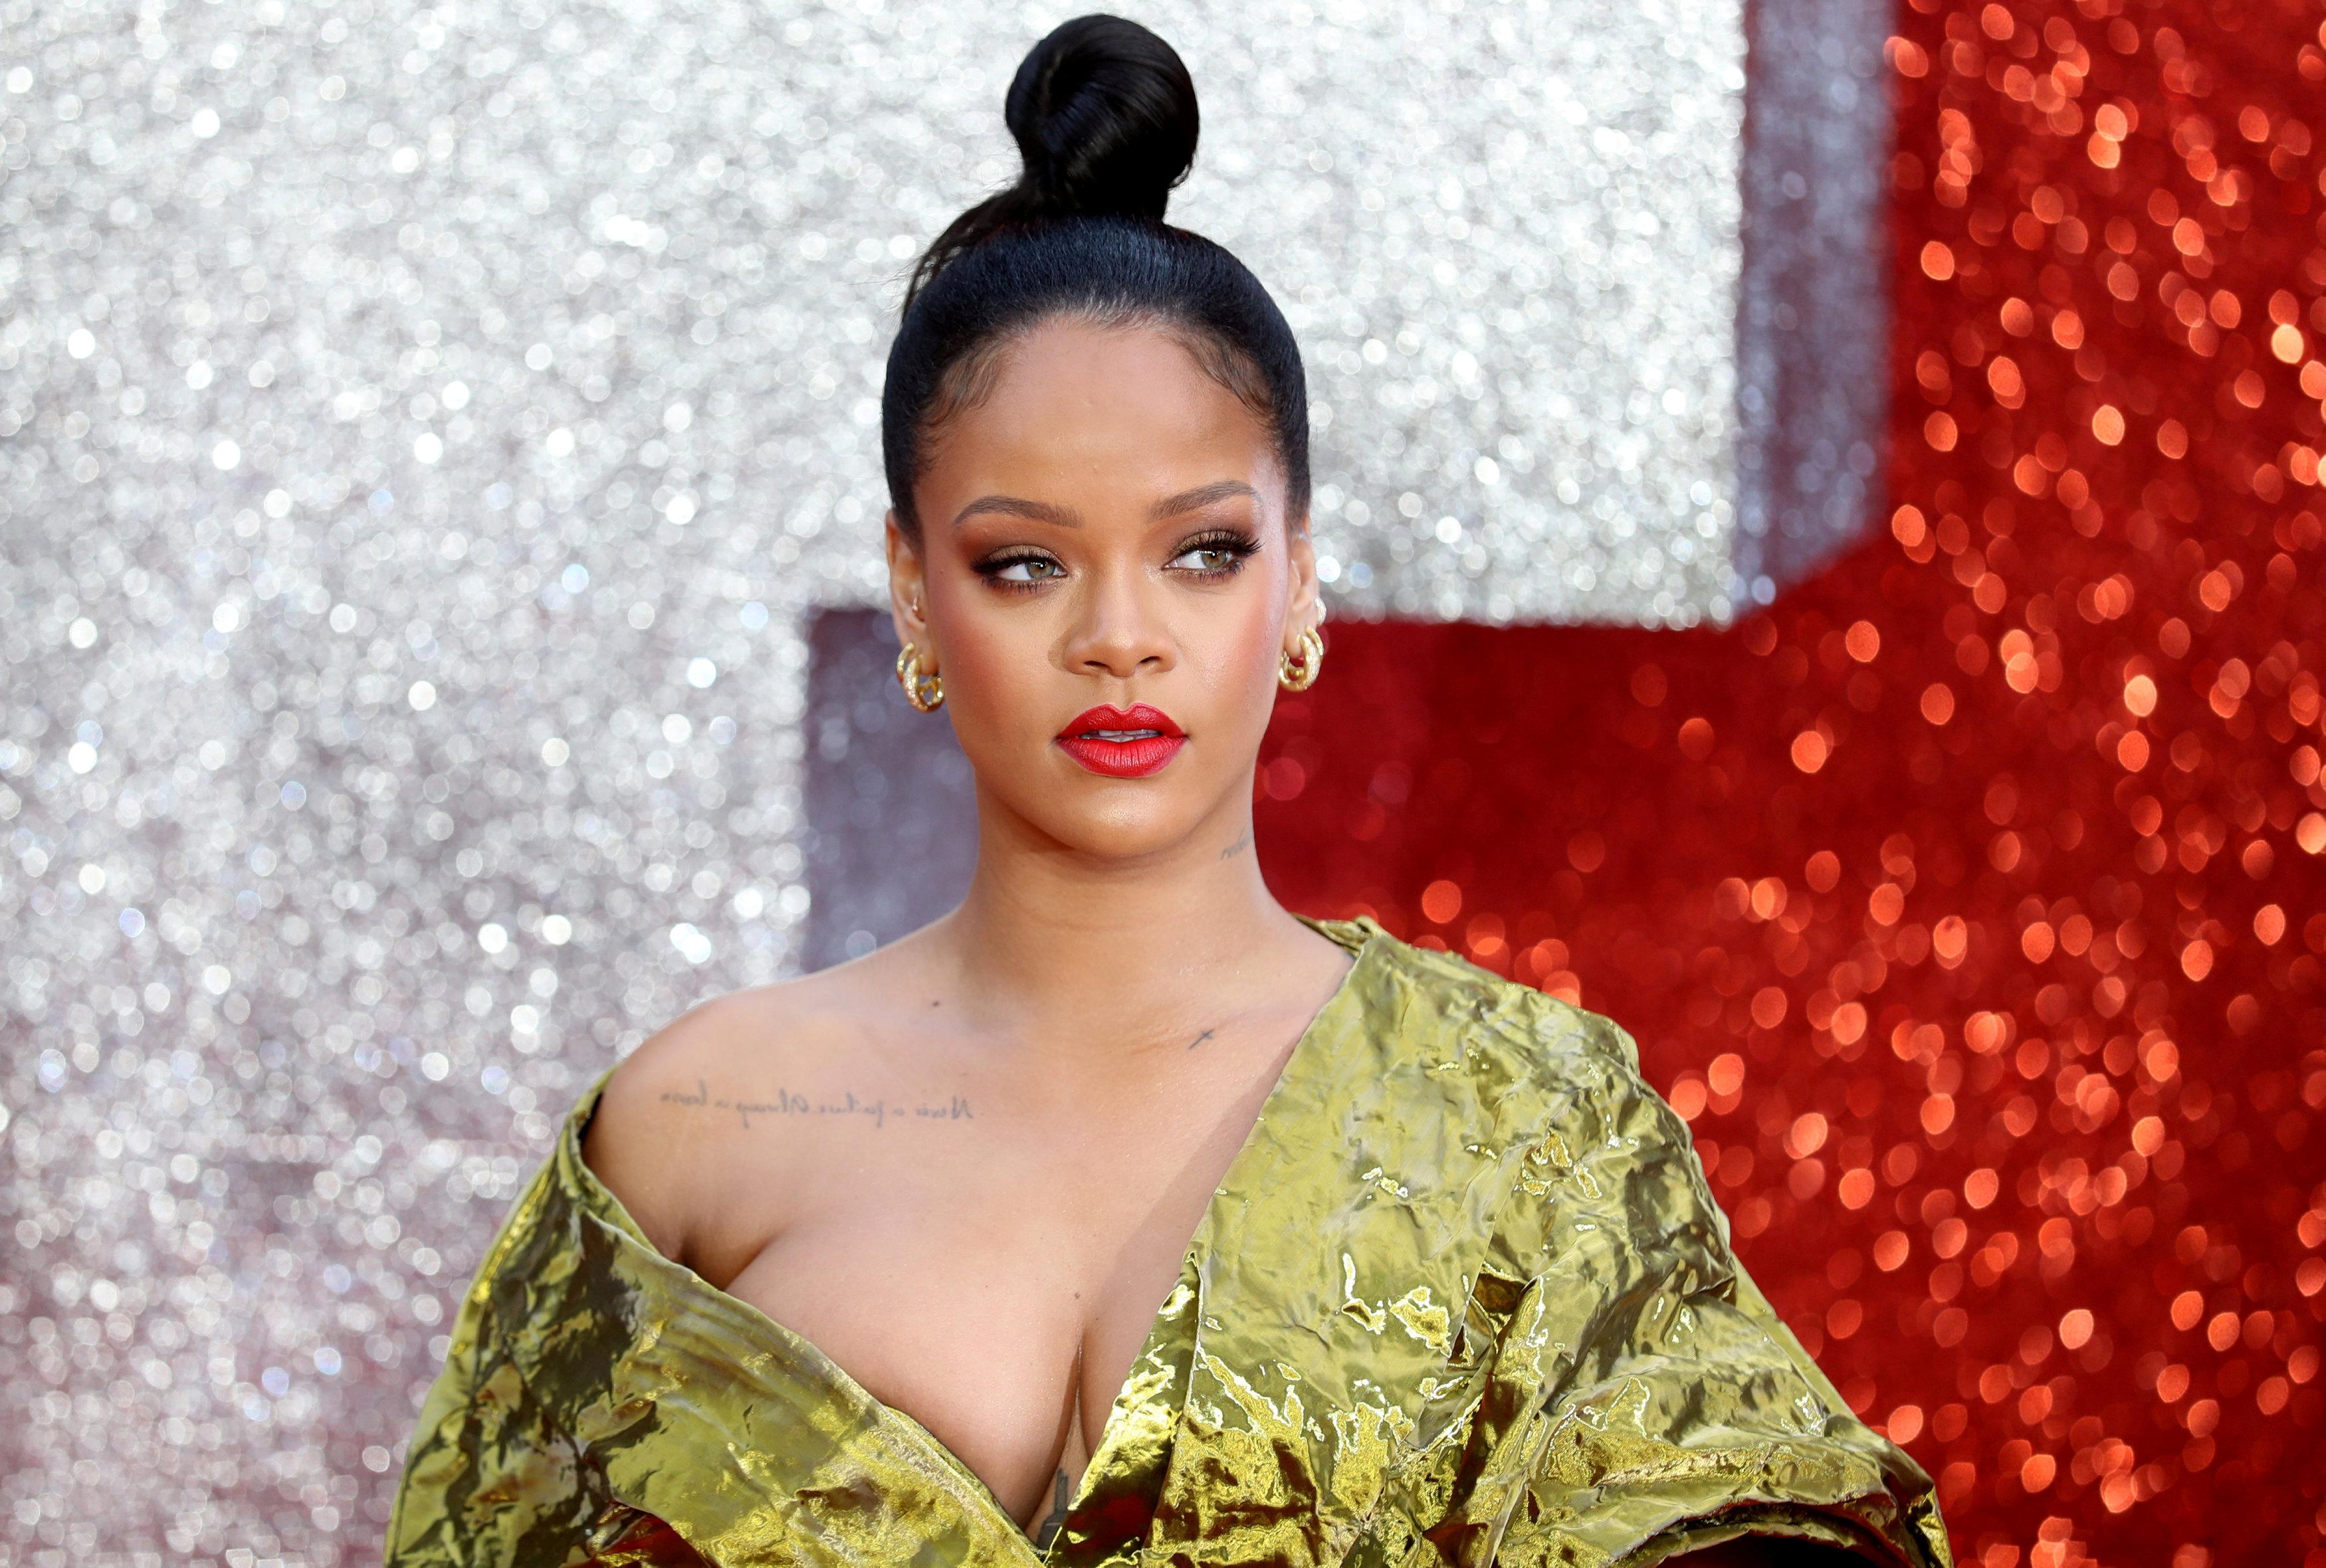 Rihanna Alami Insiden Gaun Melorot di Premier Oceans 8